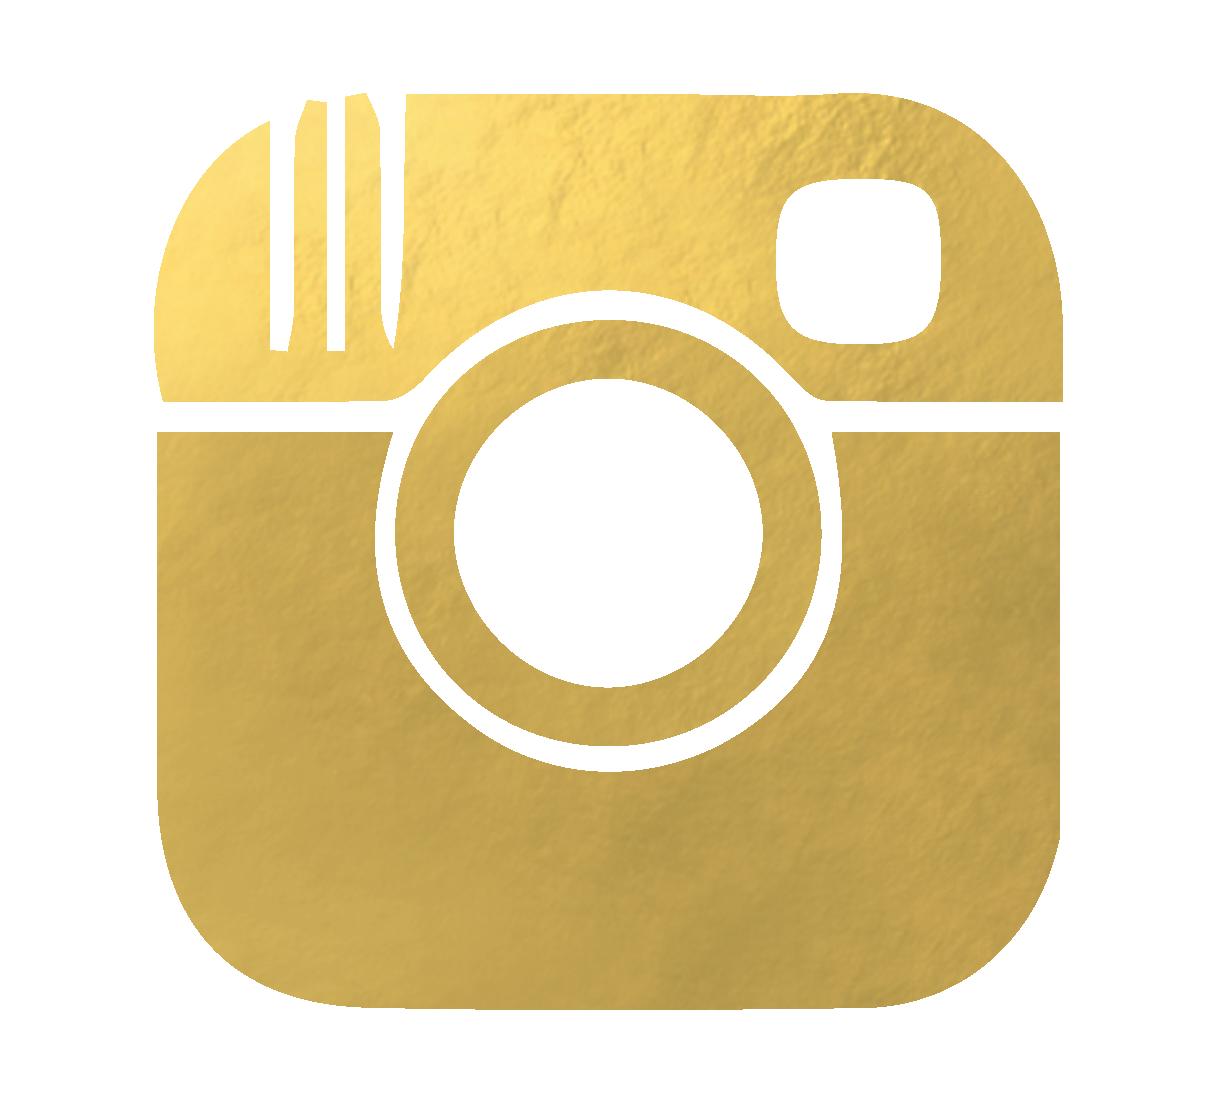 gold-foil-social-media-3-.png